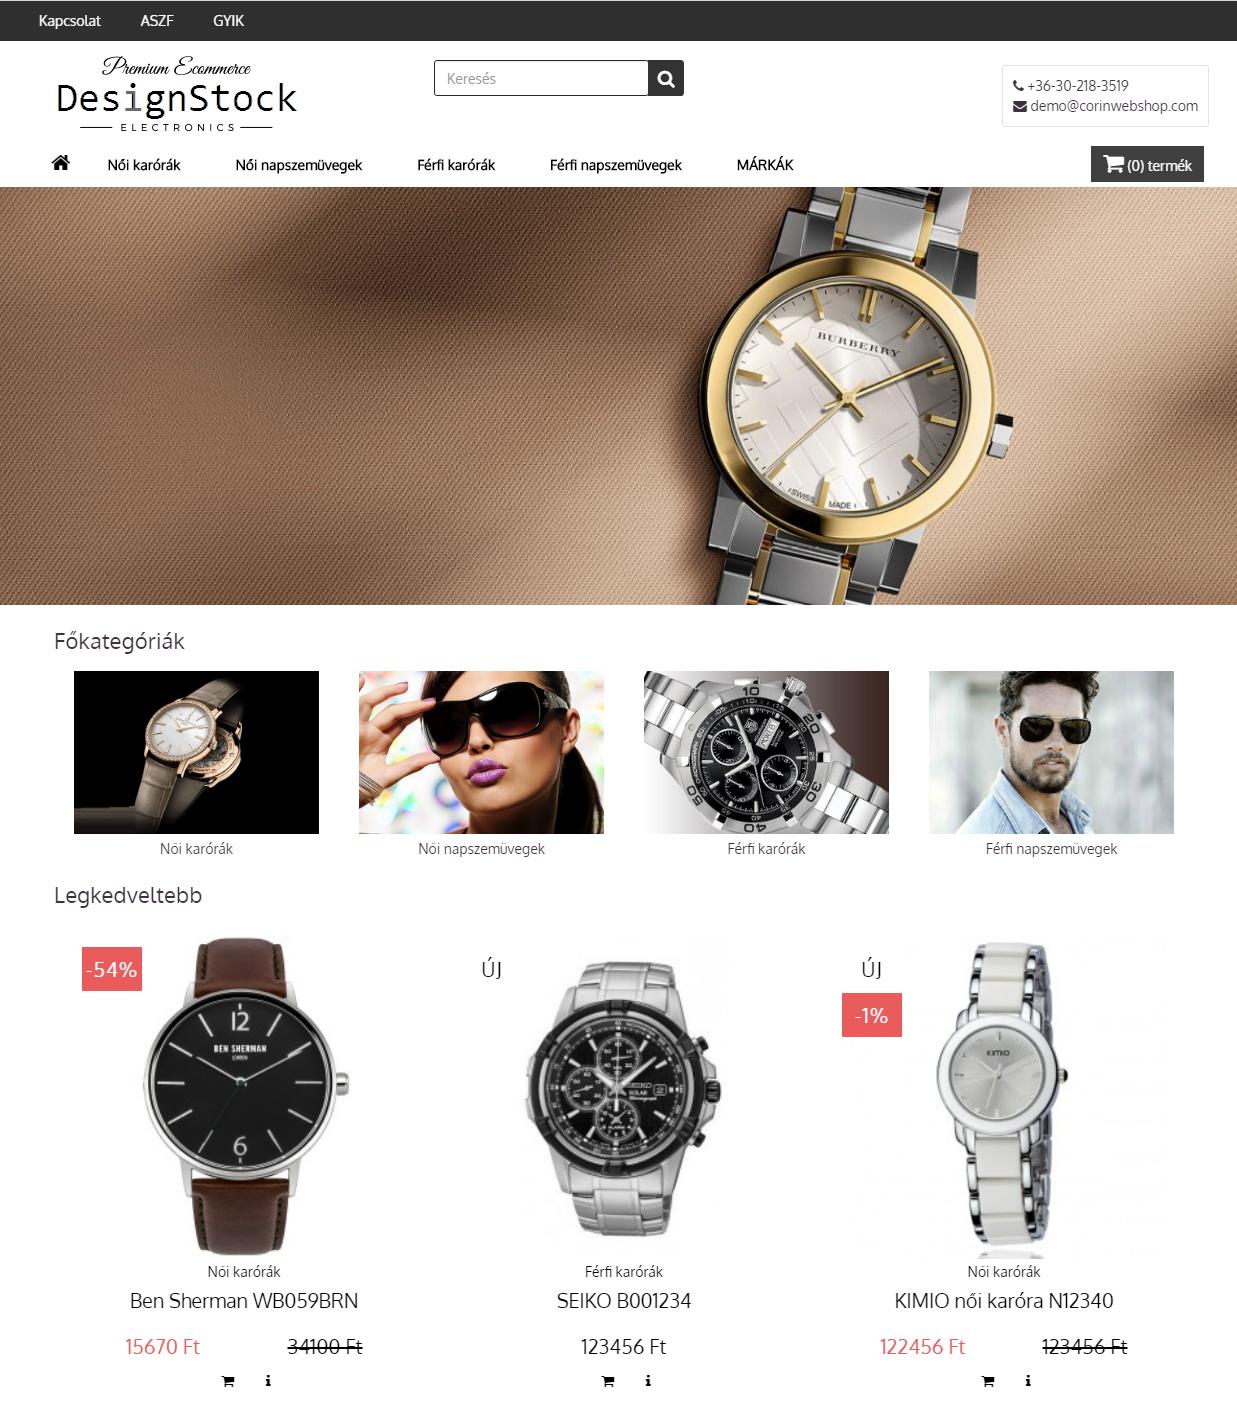 DesignStock